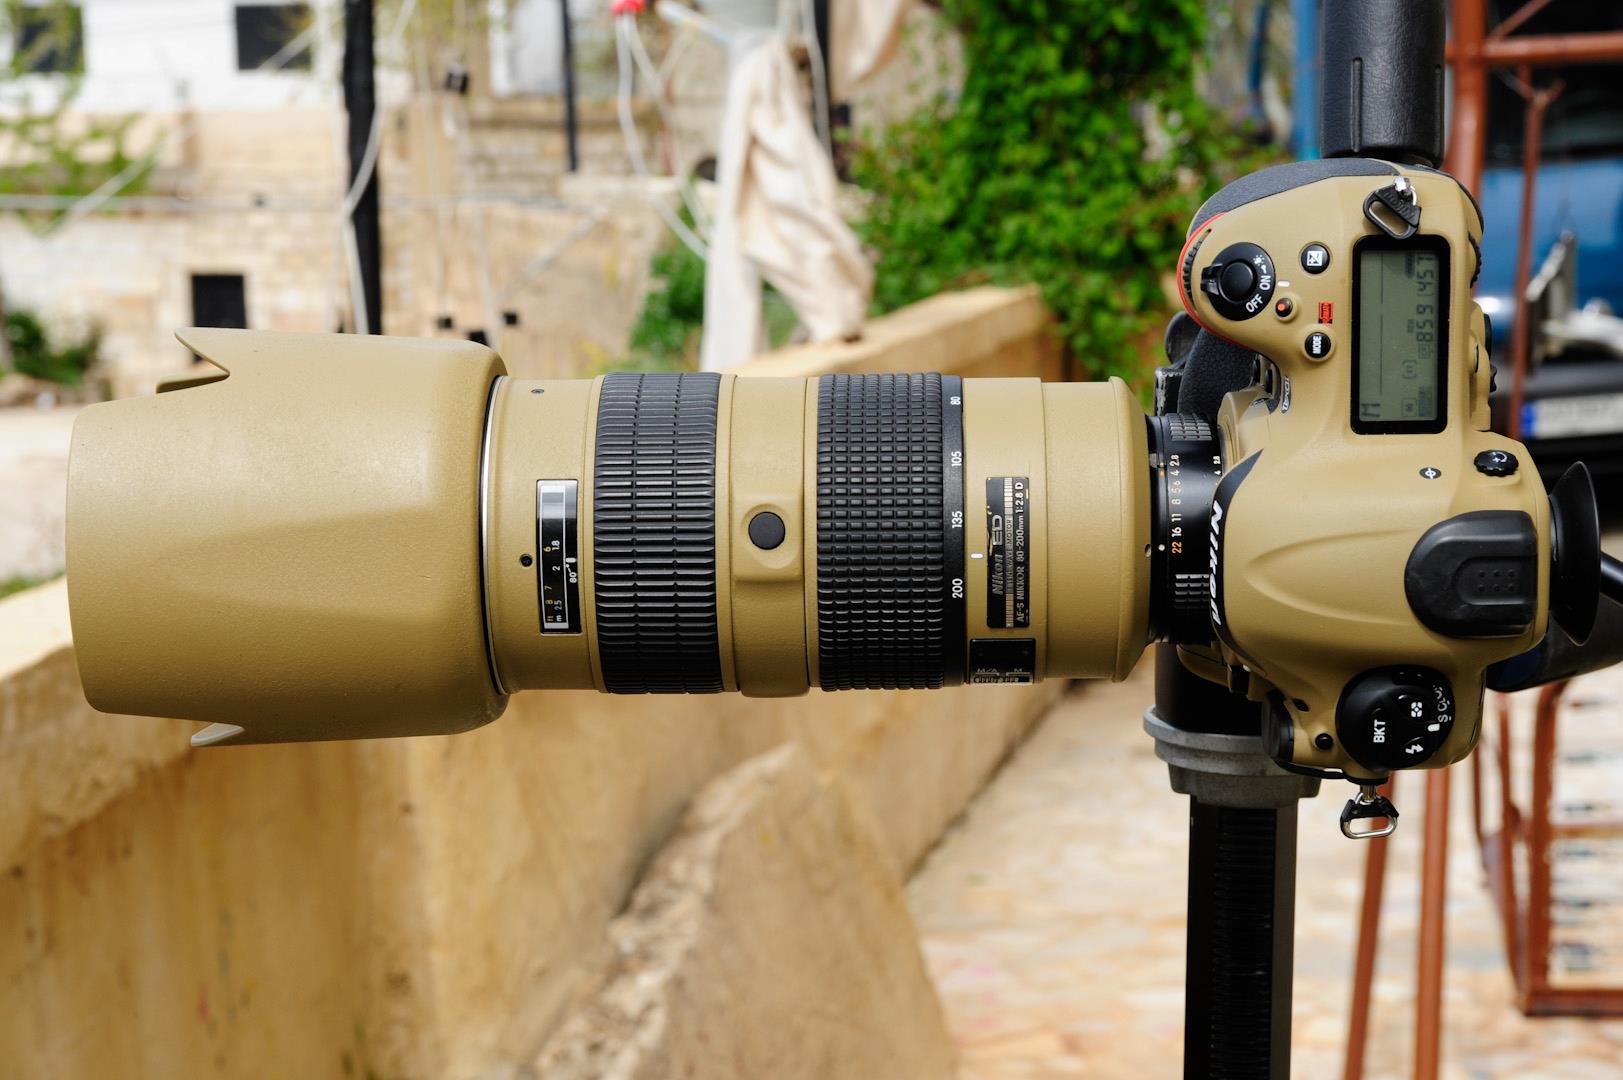 Military Grade Quot Desert Mirage Lizard Quot Painted Nikon Gear